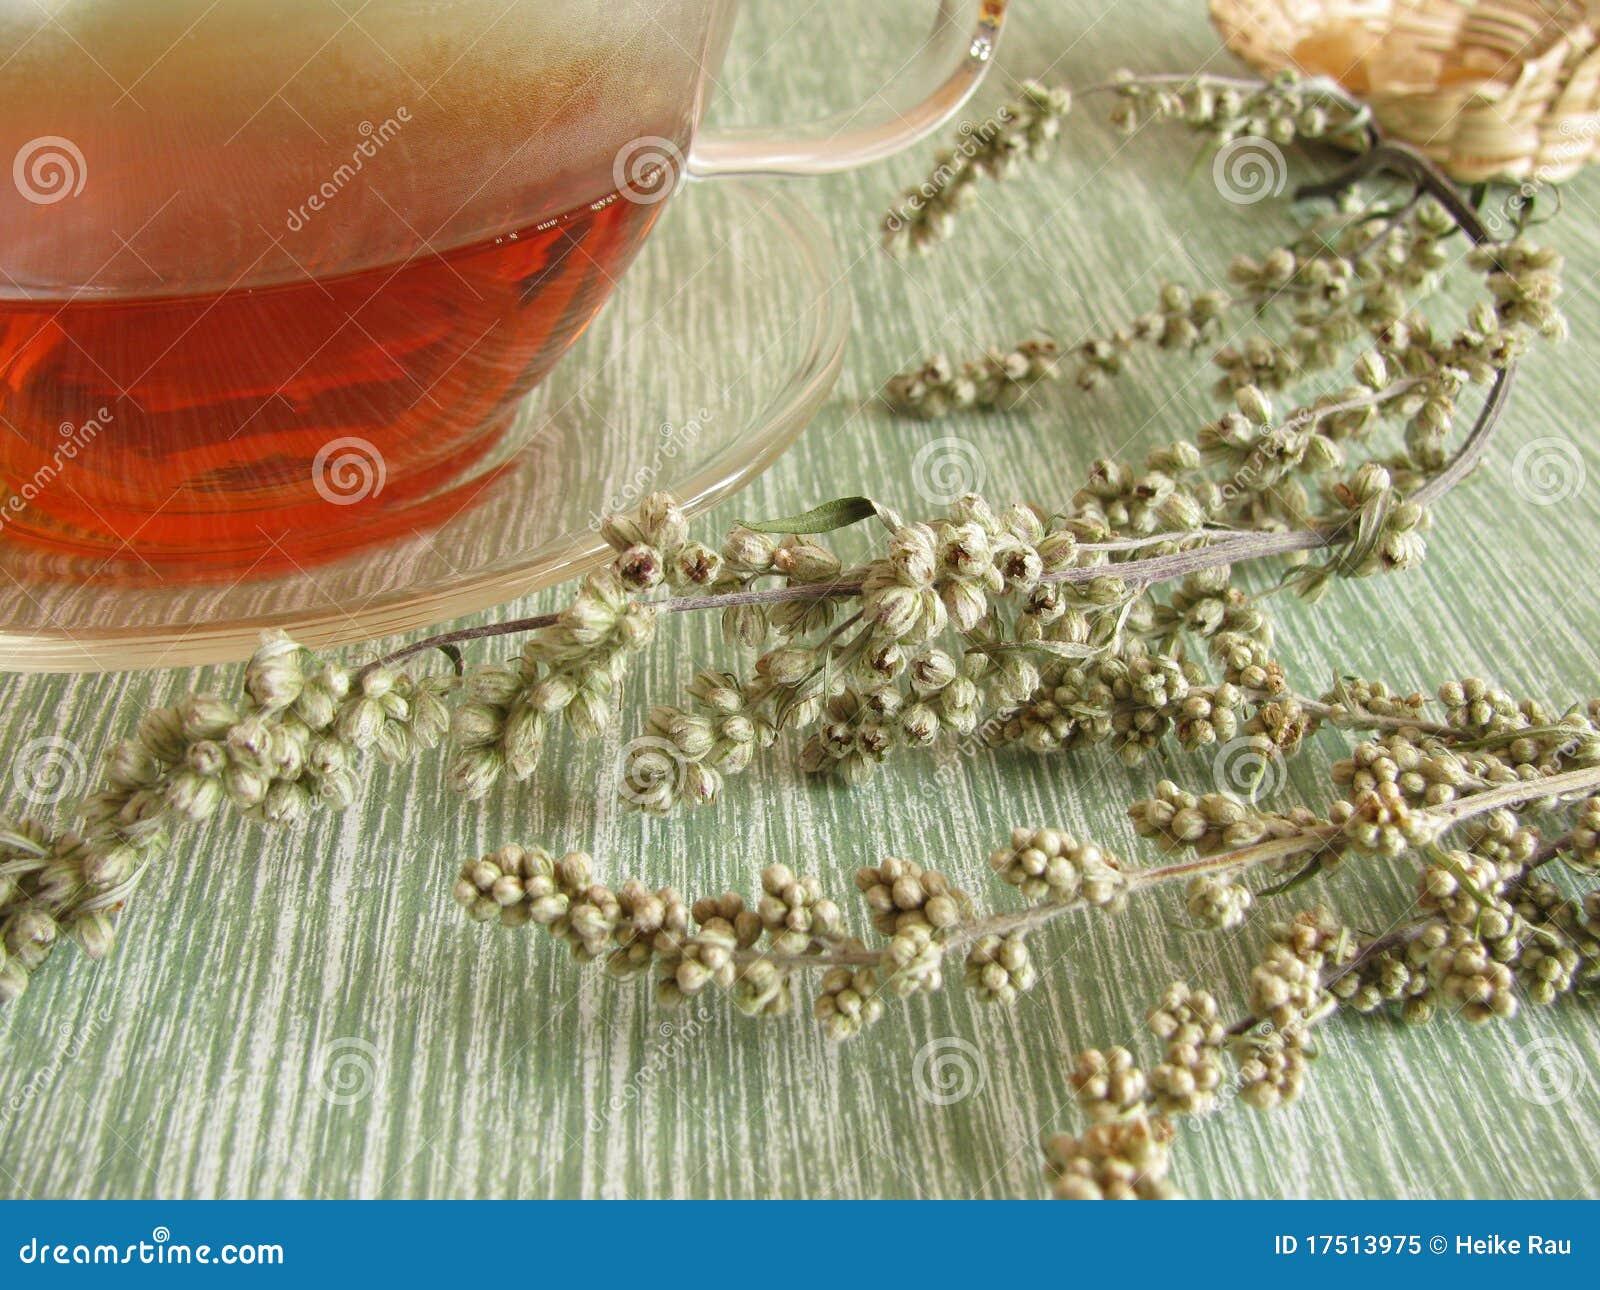 Tea with mugwort stock image  Image of artemisia, mugwort